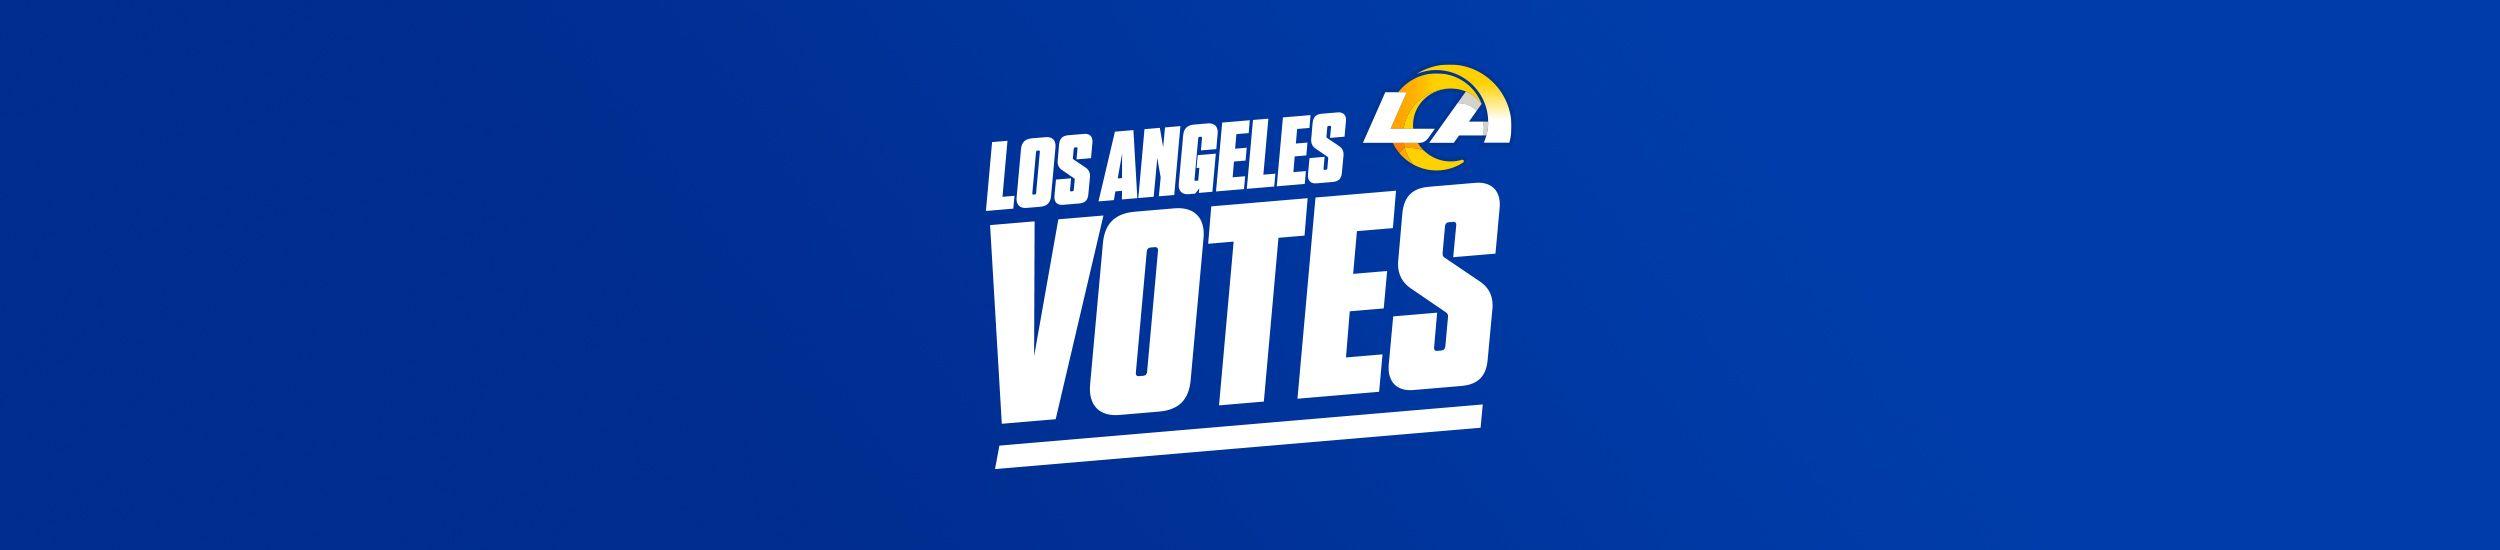 Web_Vote_la vote